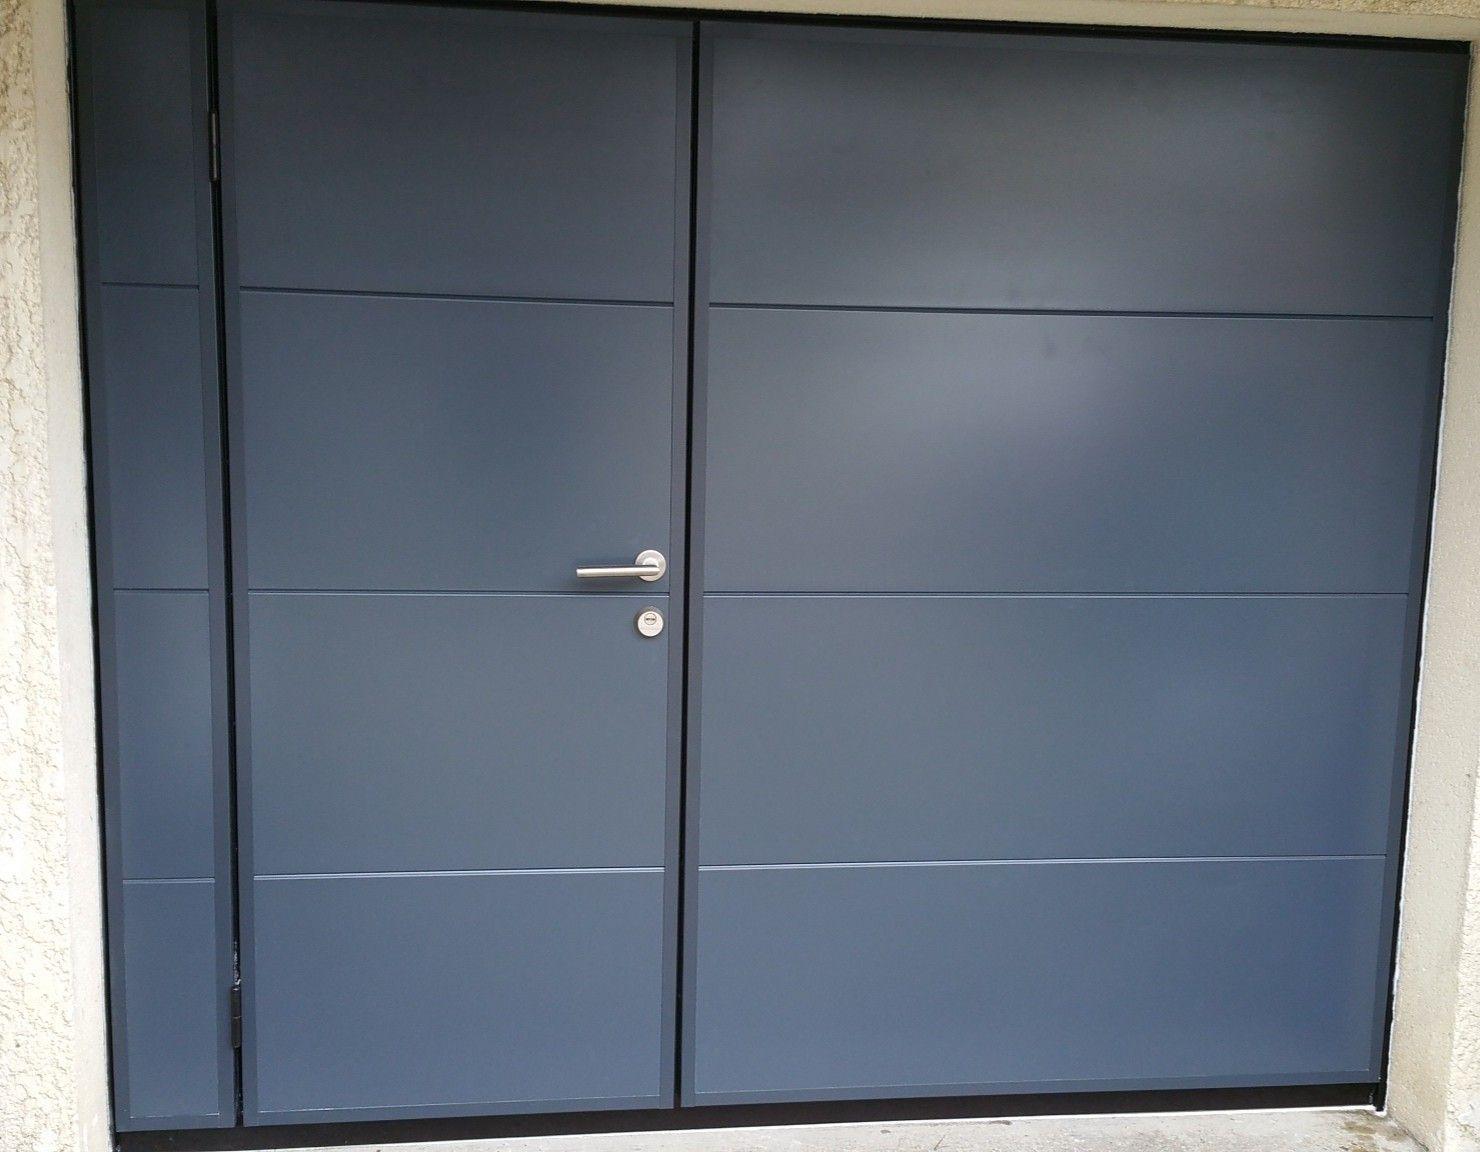 Porte Basculante Avec Vrai Portillon Securise A2p Tuquet Porte Garage Portes De Garage Moderne Porte Basculante